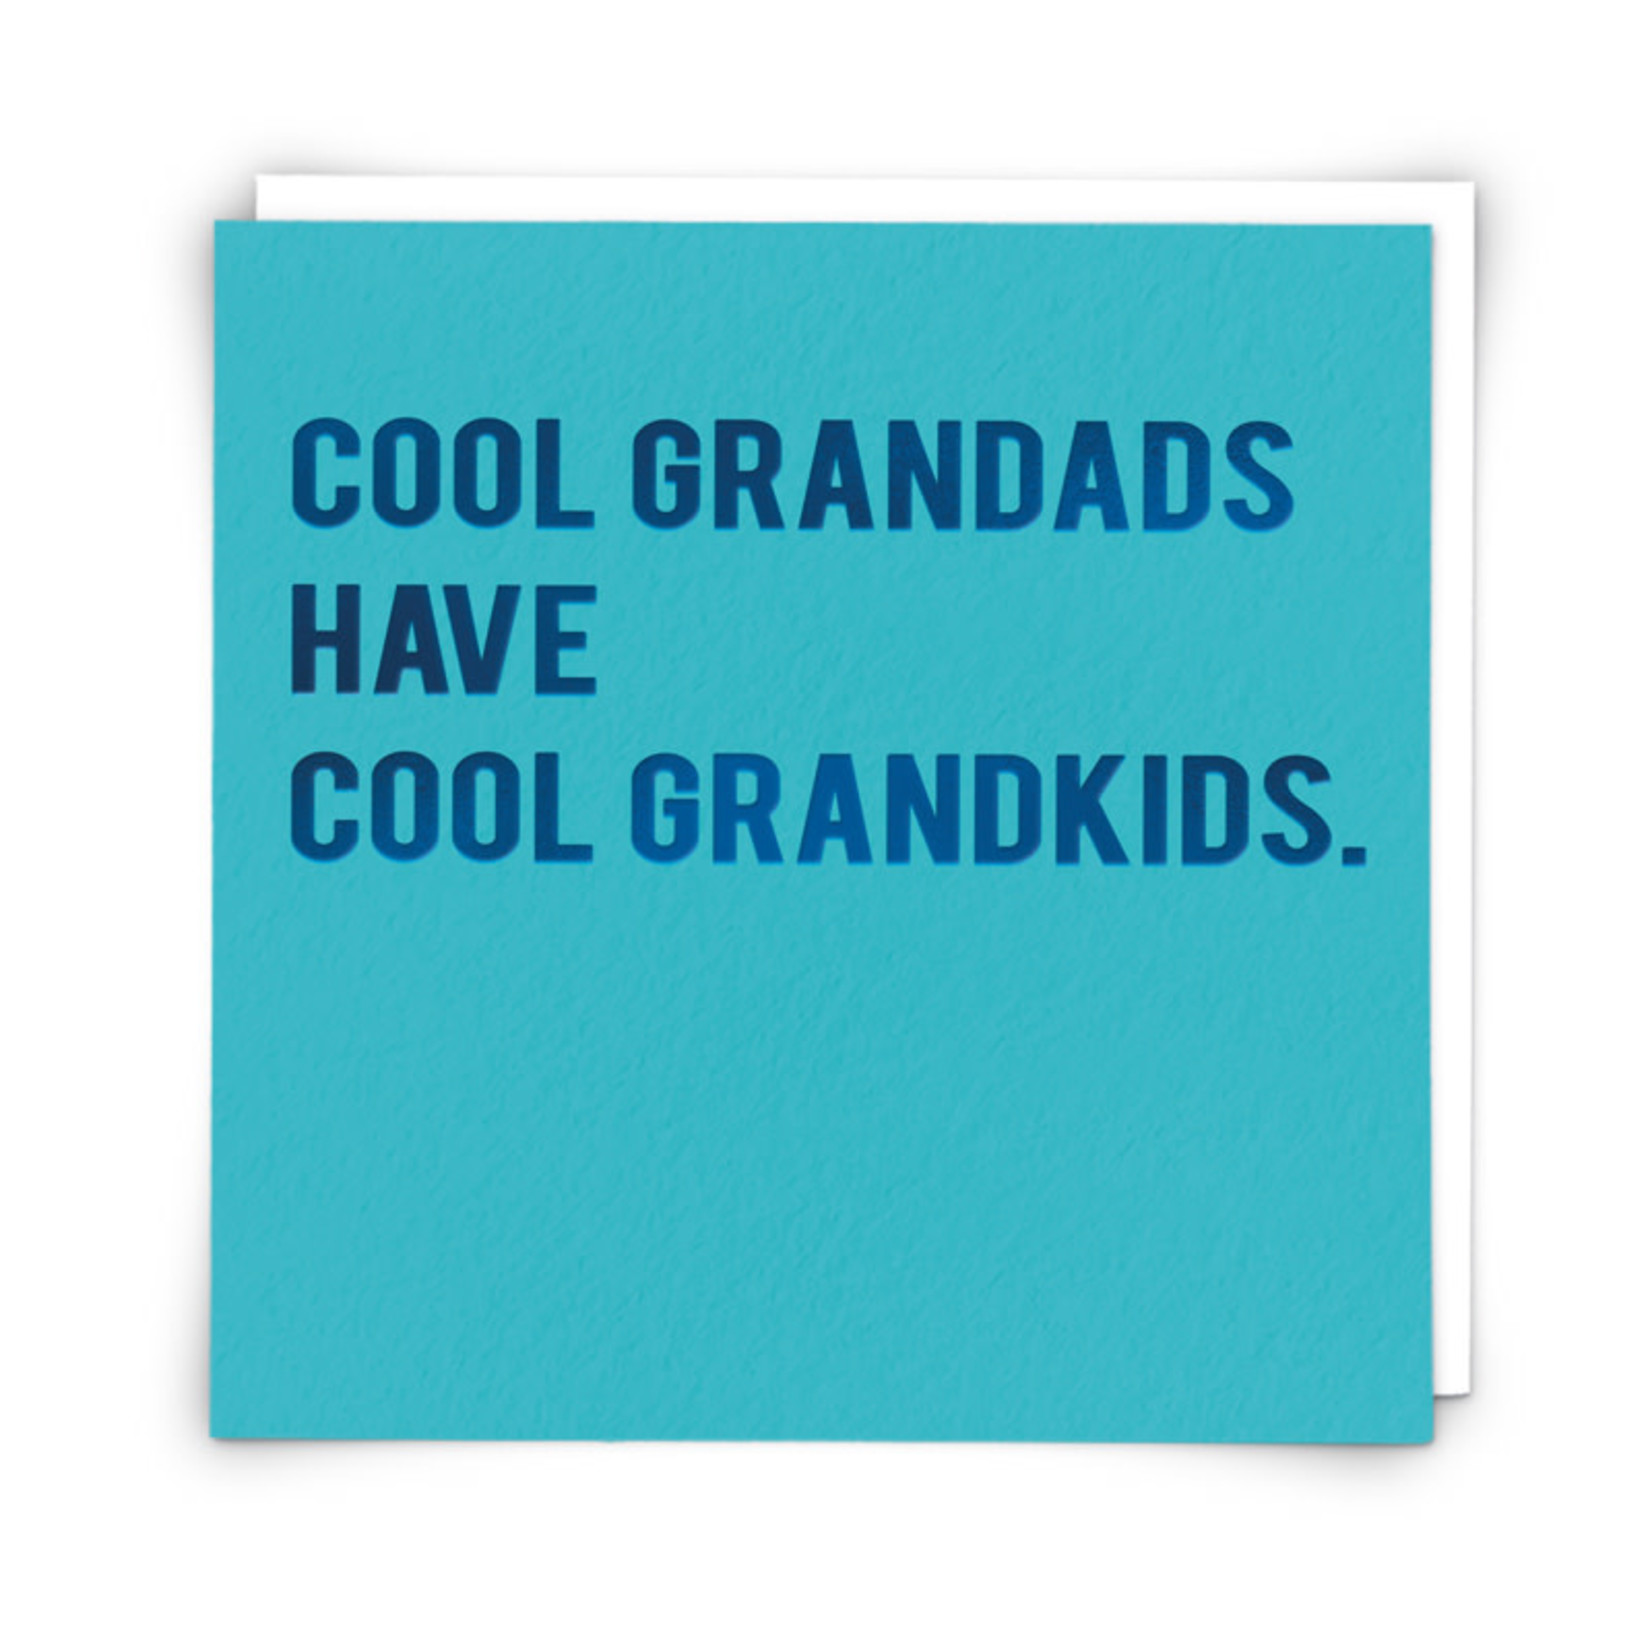 Redback Cards Cool Grandads have cool grandkids Card